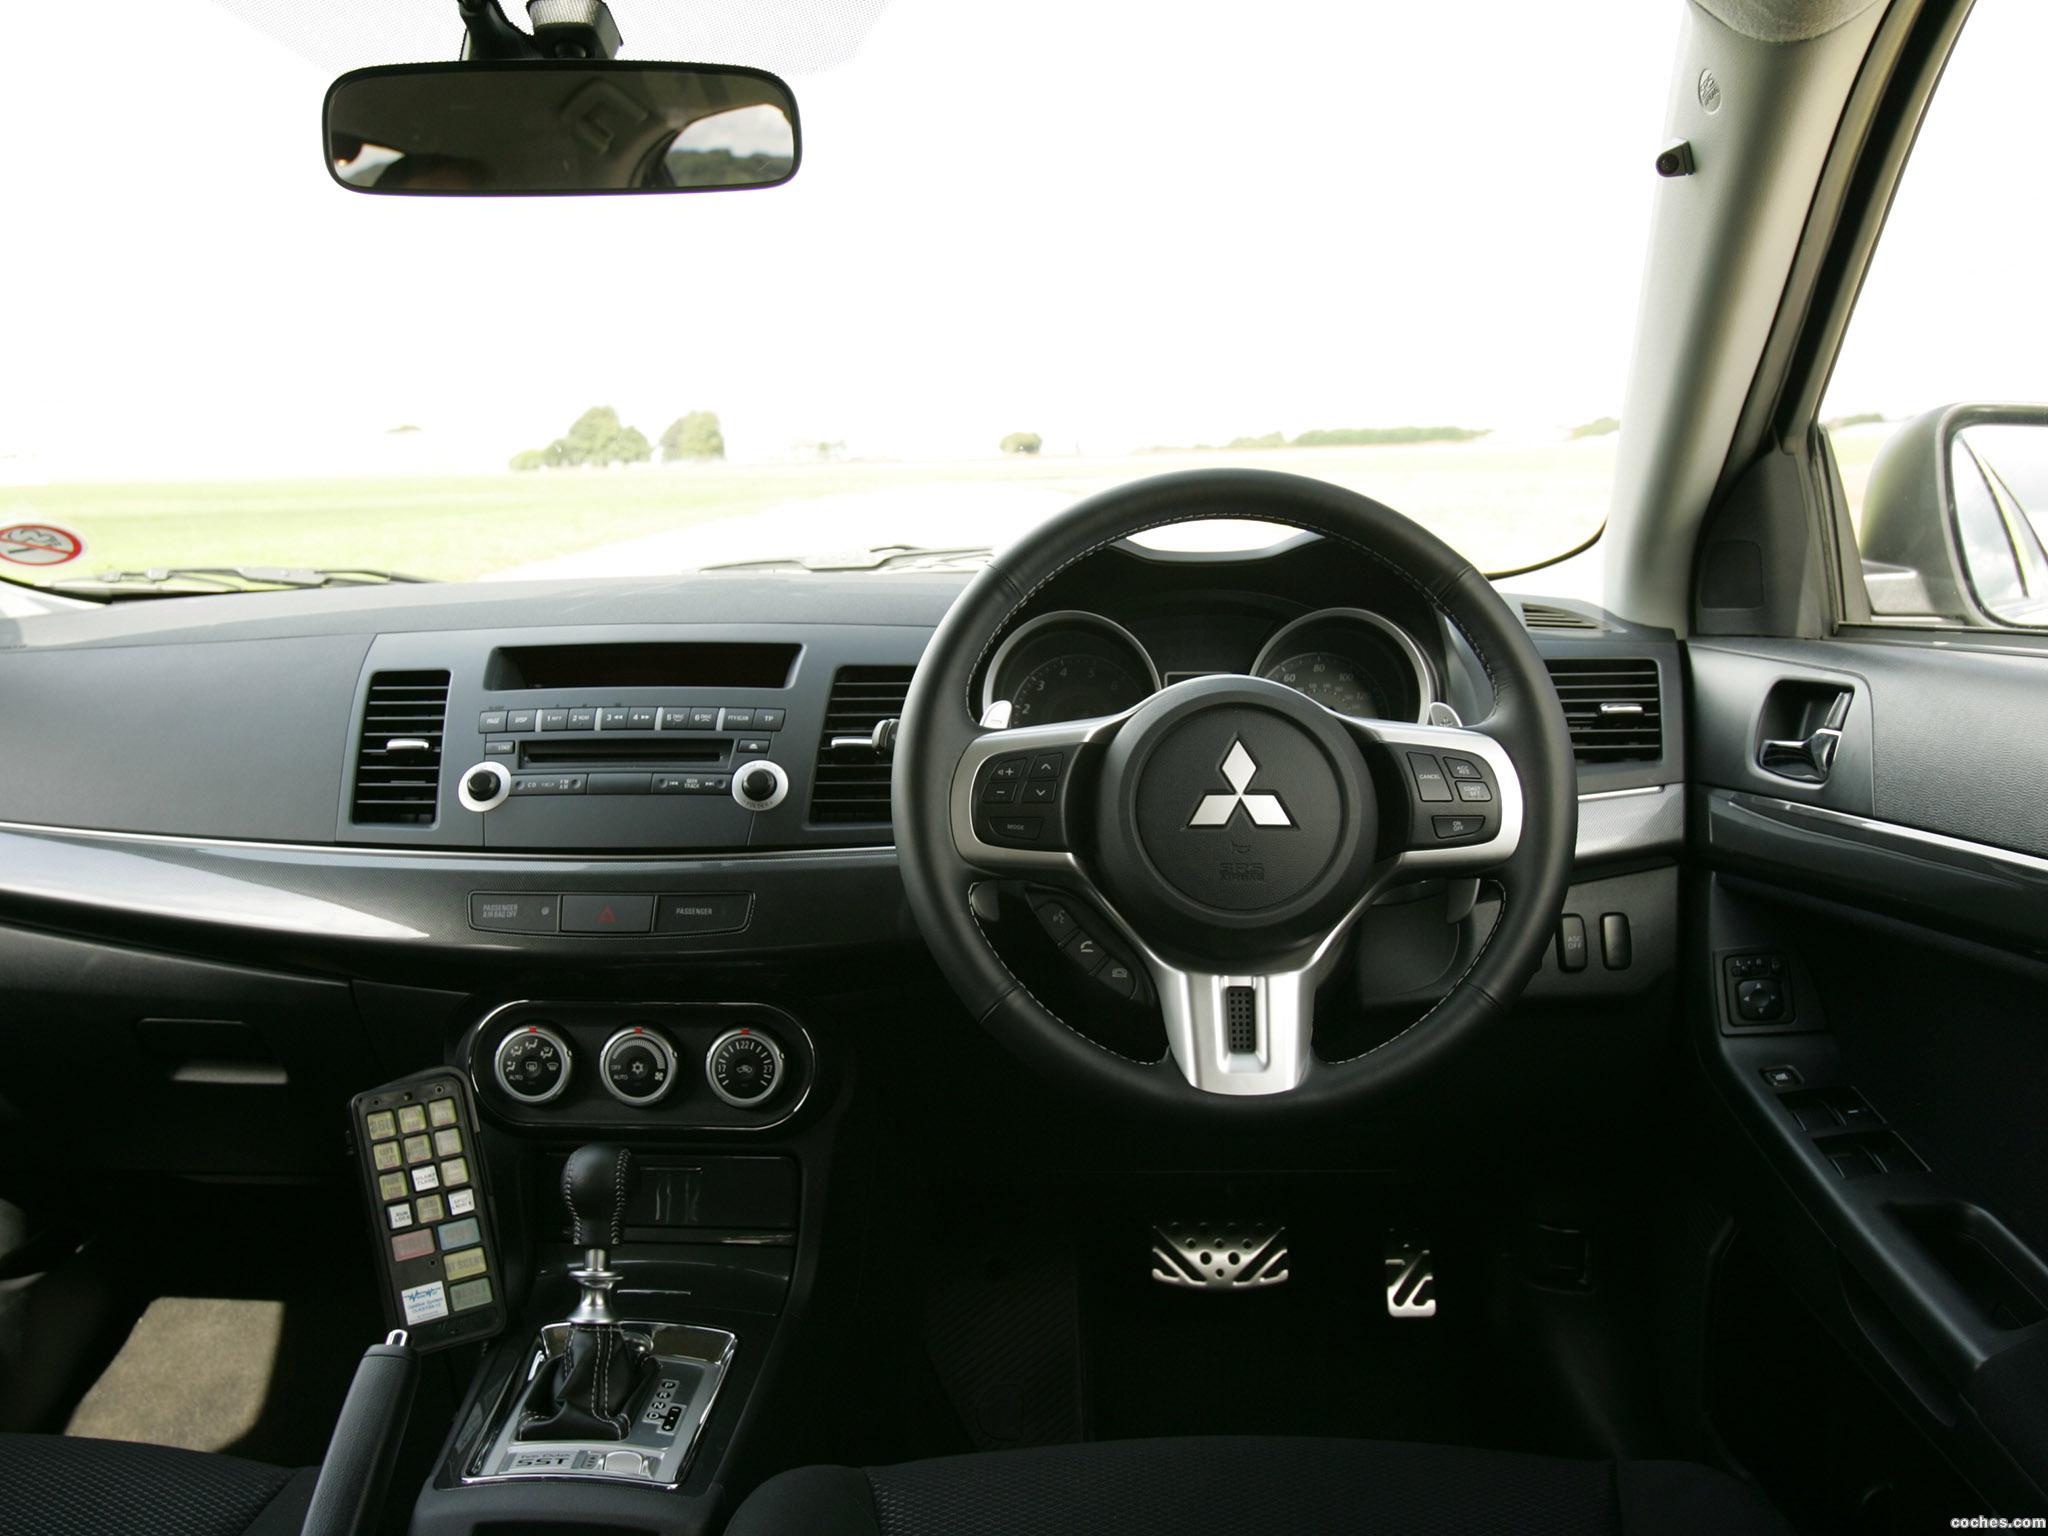 Foto 8 de Mitsubishi Lancer Sportback UK Police 2009